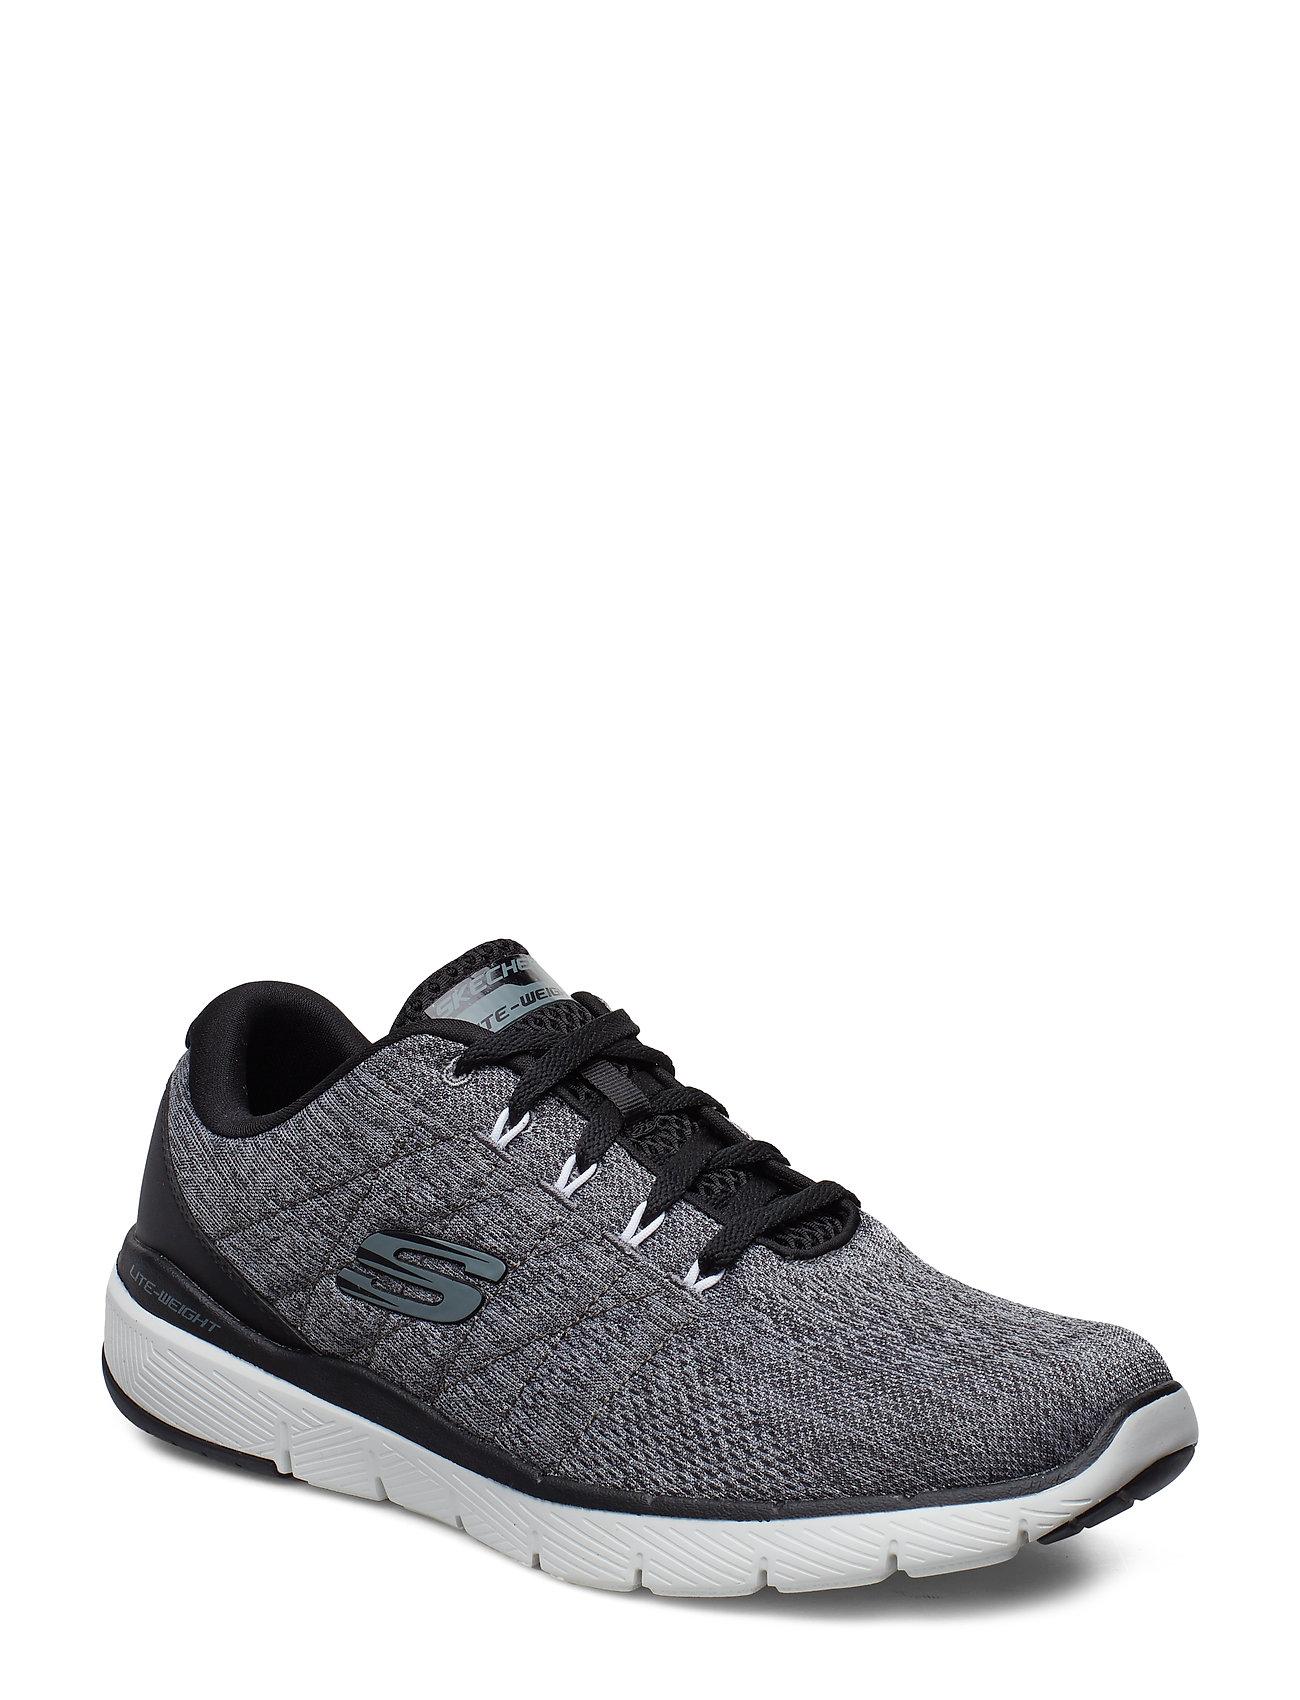 SKECHERS 51286GYOR Stamina Cutback Herren Sneaker grau